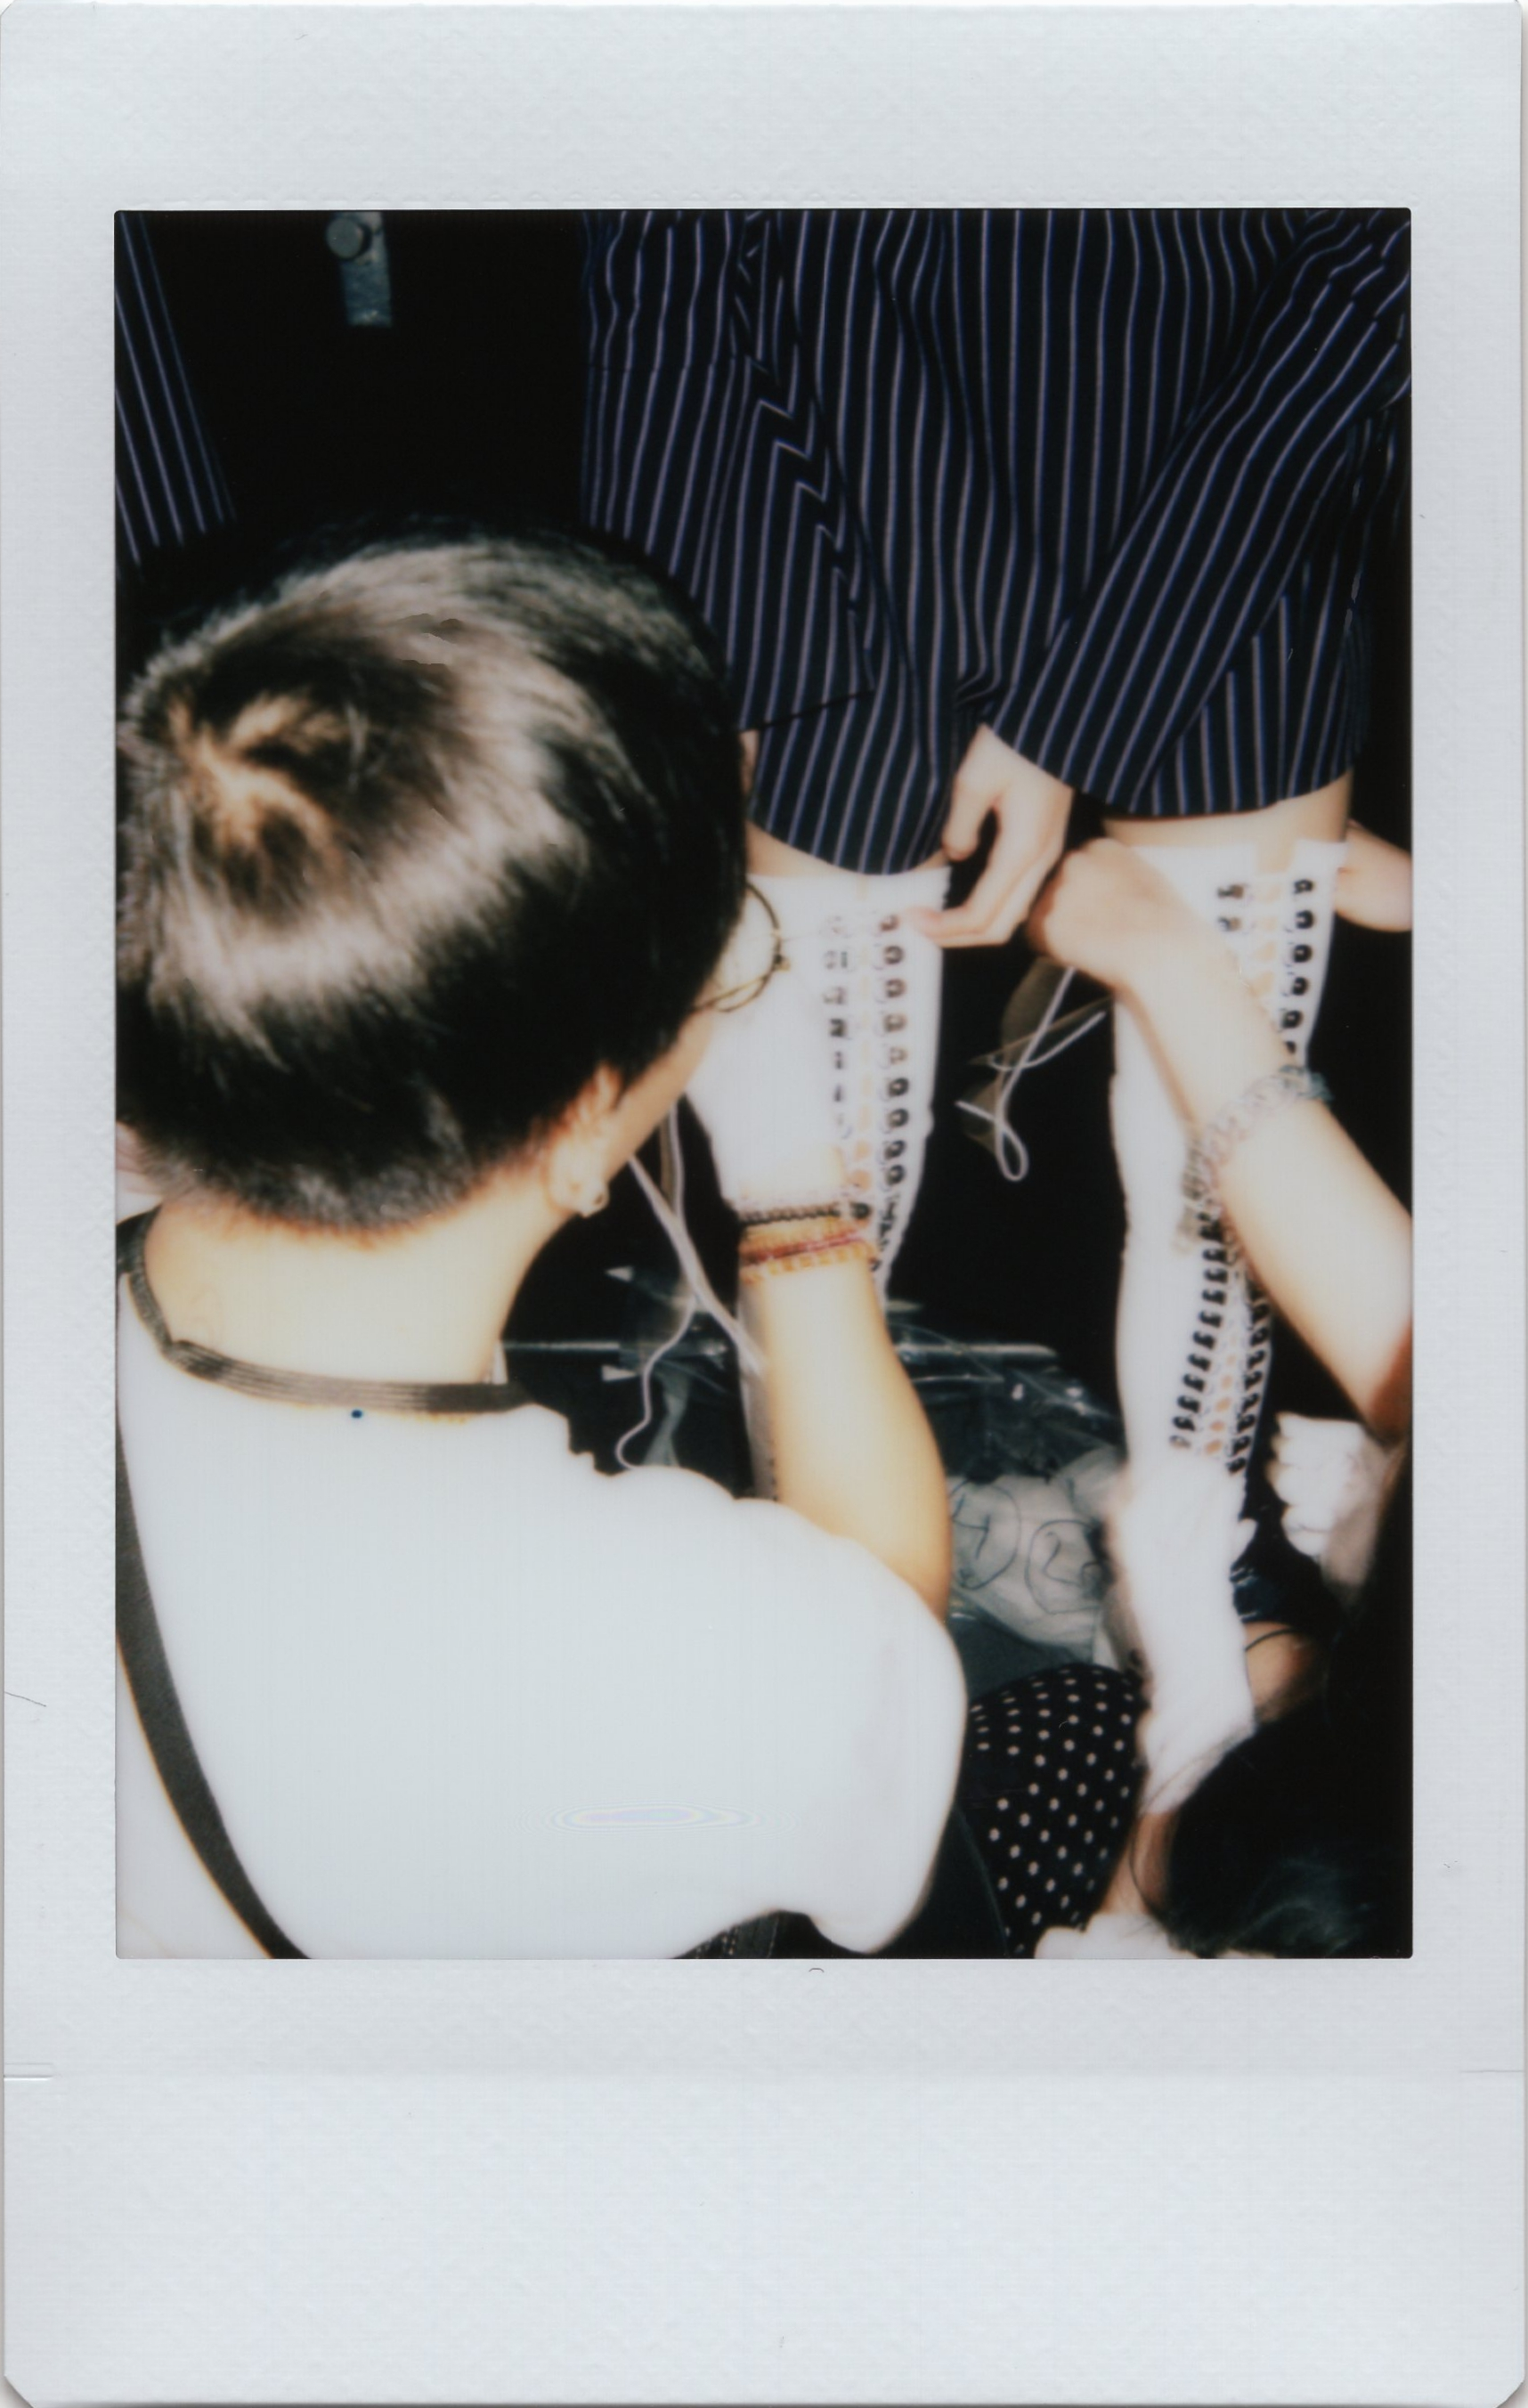 Mashama_Honigschreck_Backstage_Polaroid_6.jpg